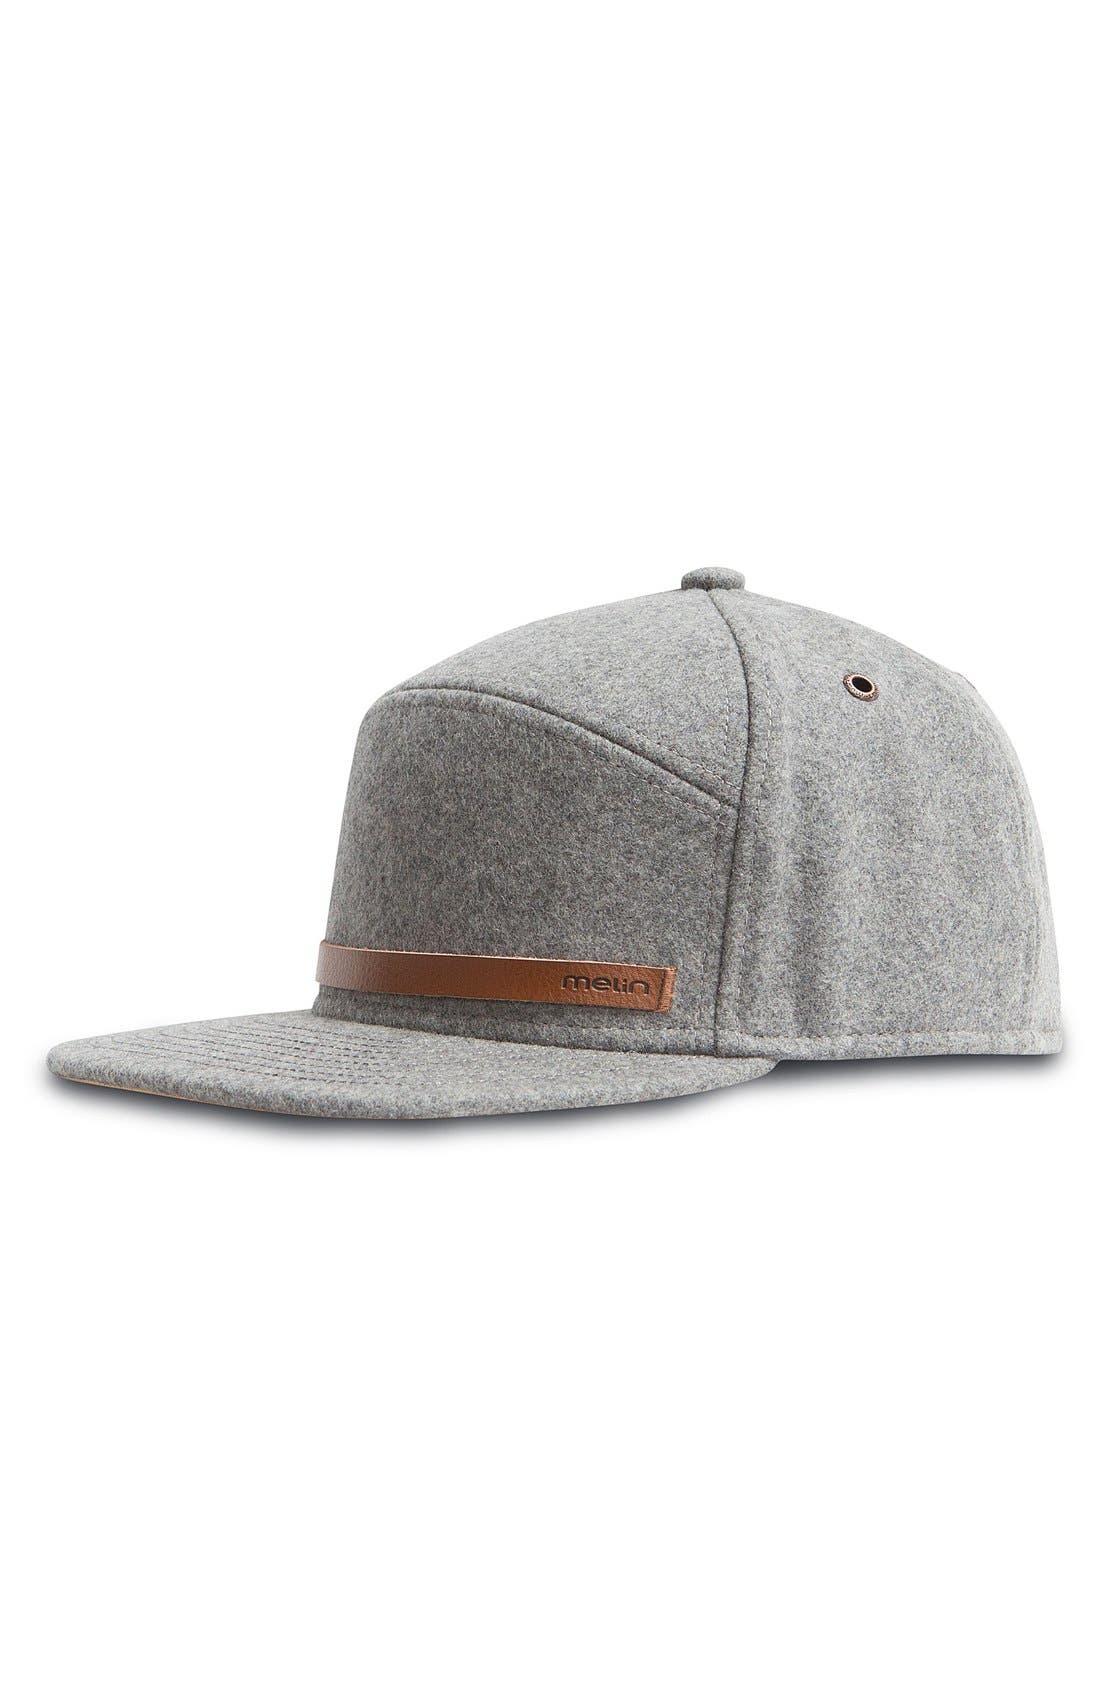 Melin Rancher Snapback Baseball Cap